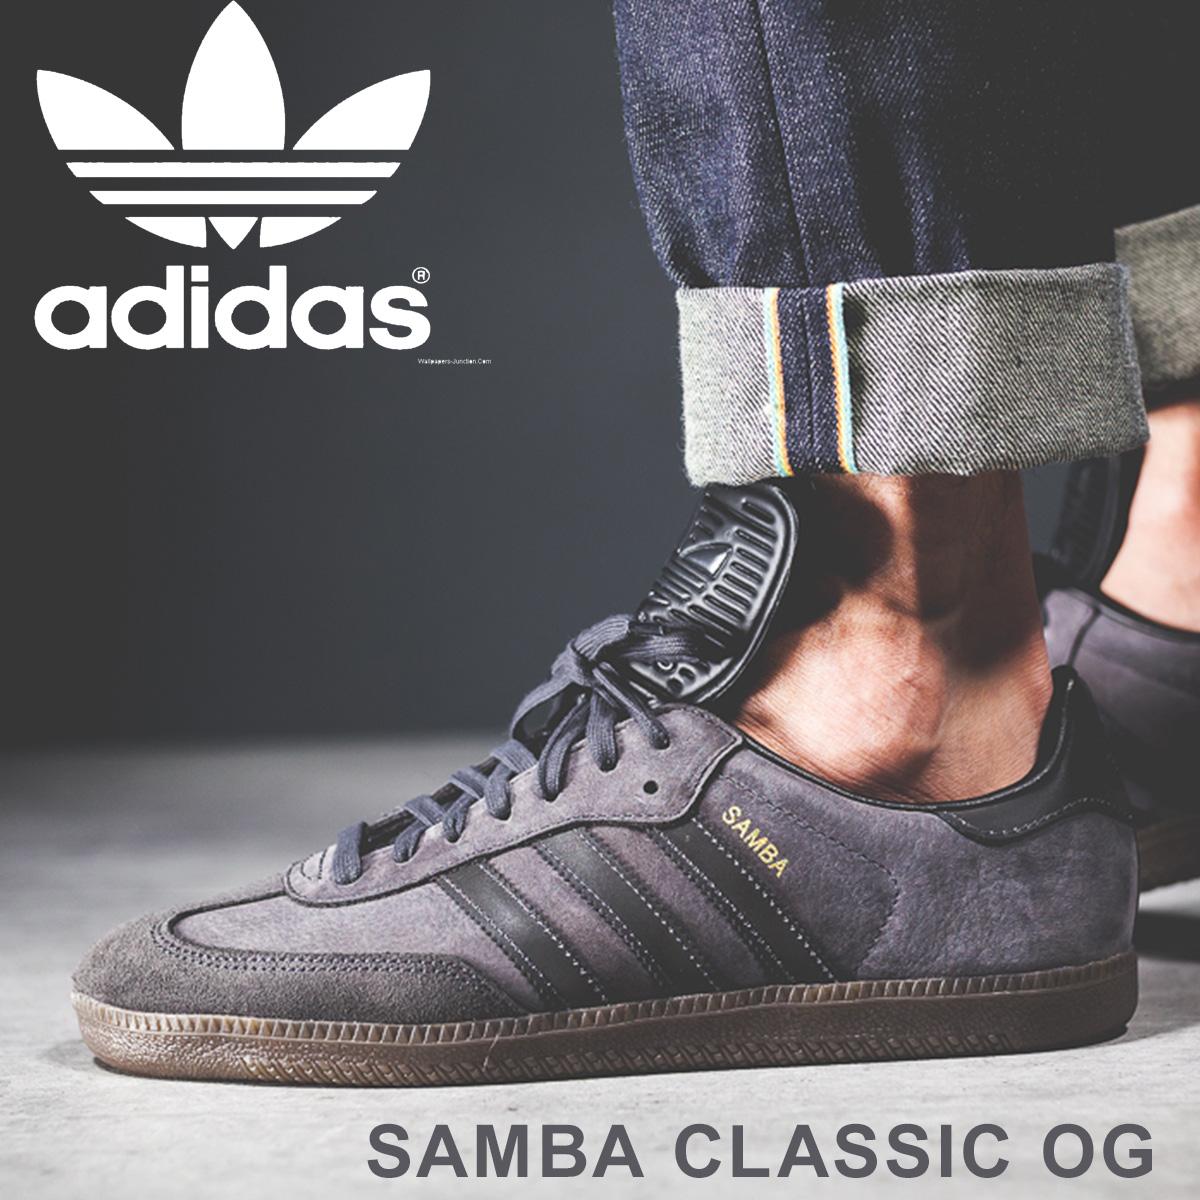 95a8fc66905 adidas Originals samba Adidas sneakers SAMBA CLASSIC OG men BZ0227 black  originals  load planned Shinnyu load in reservation product 3 20 containing